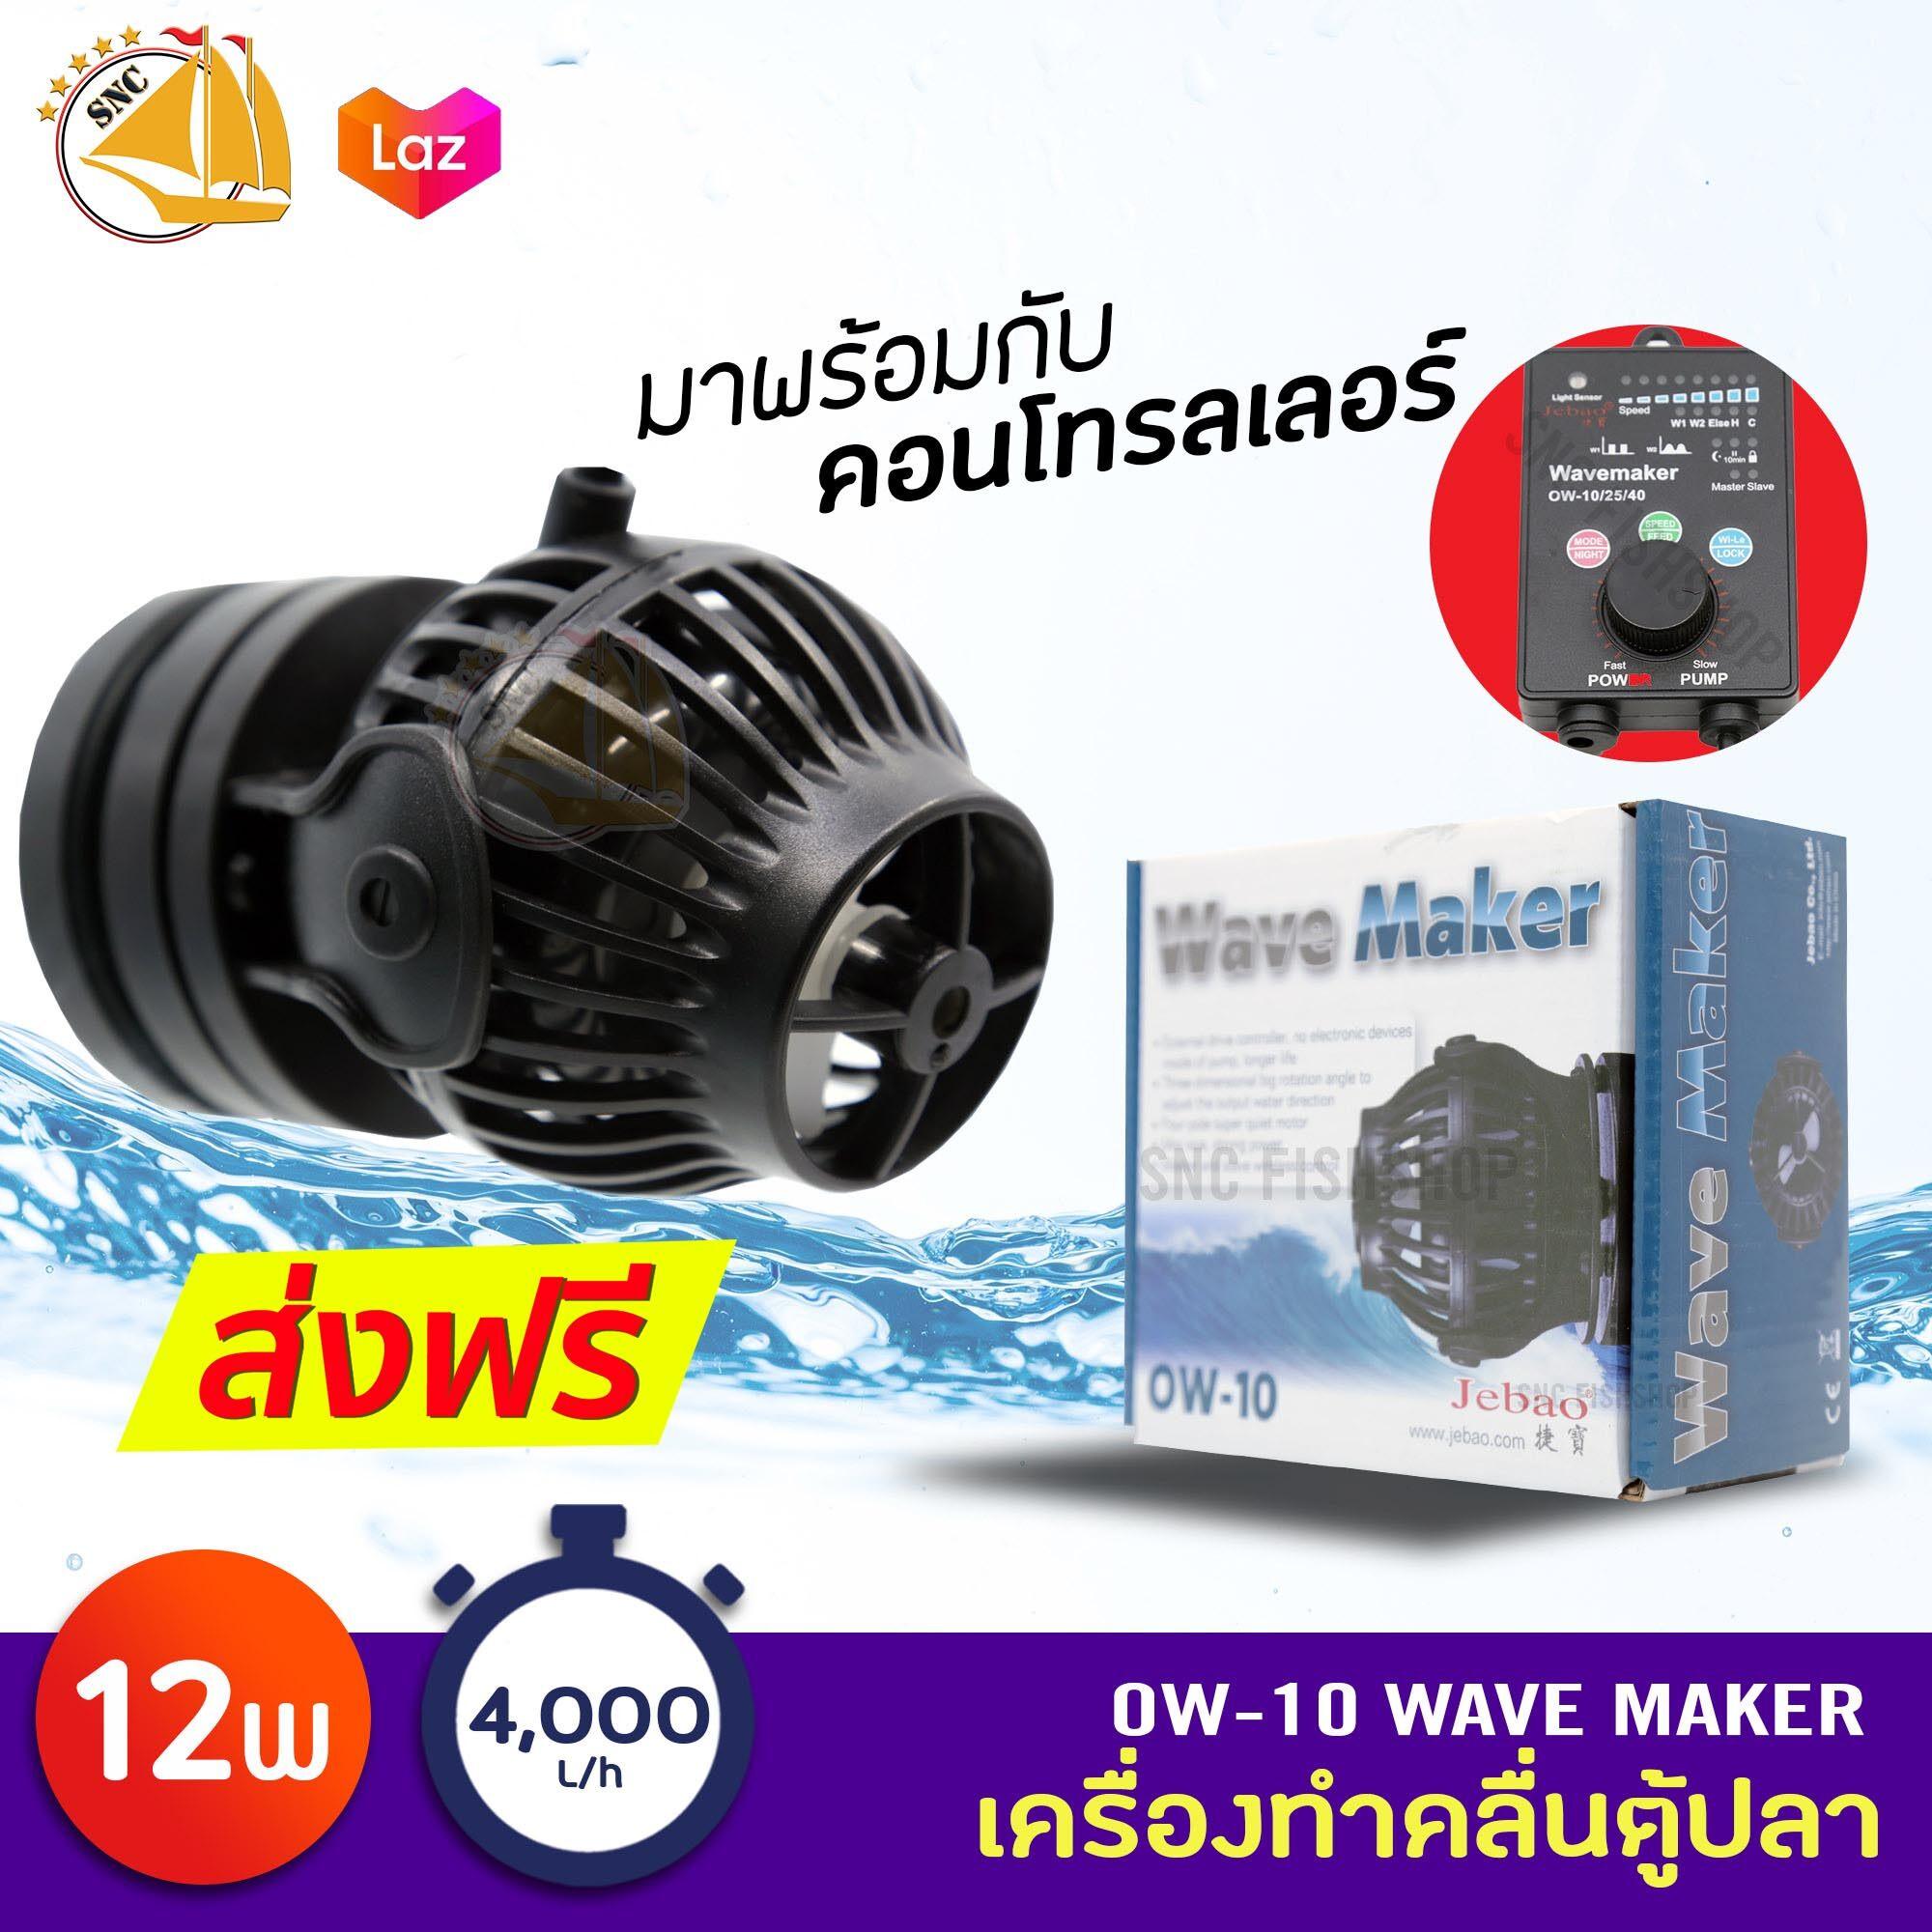 Jebao Wave Maker OW-10 เครื่องทำคลื่นตู้ปลาทะเล 12w 4000L/h